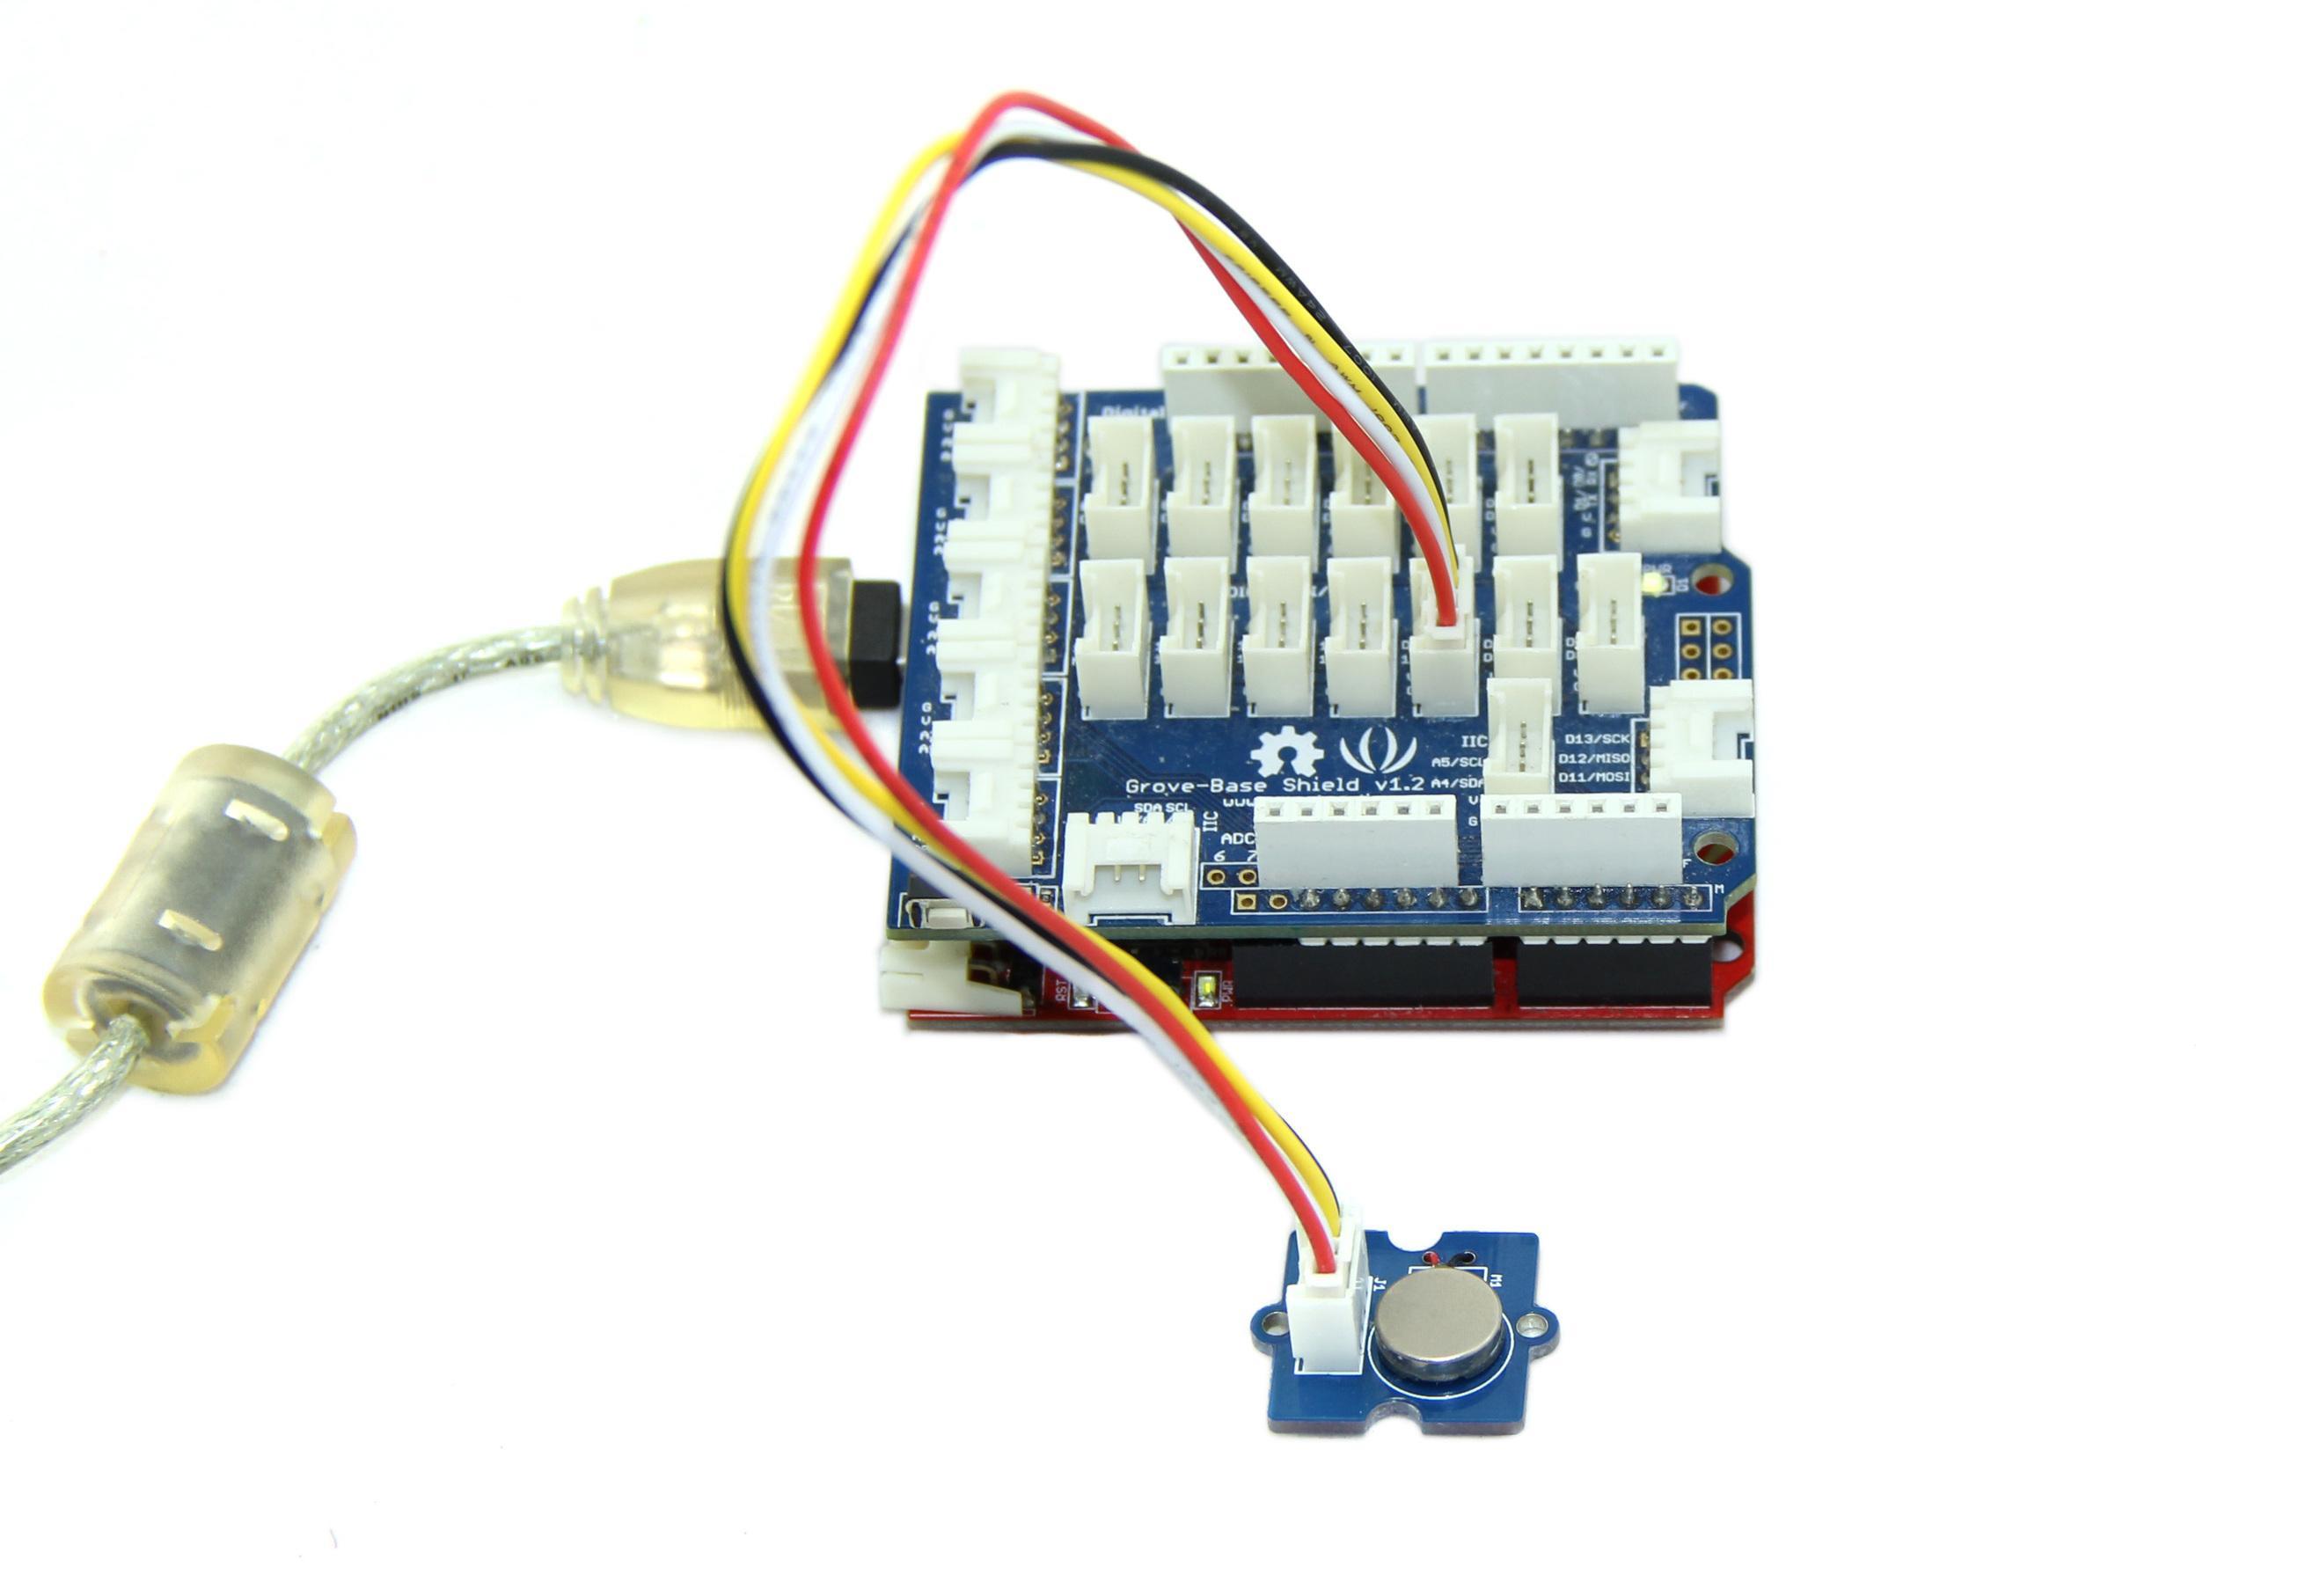 Grove Vibration Motor Voice Control Circuit Scr Music Sound Note